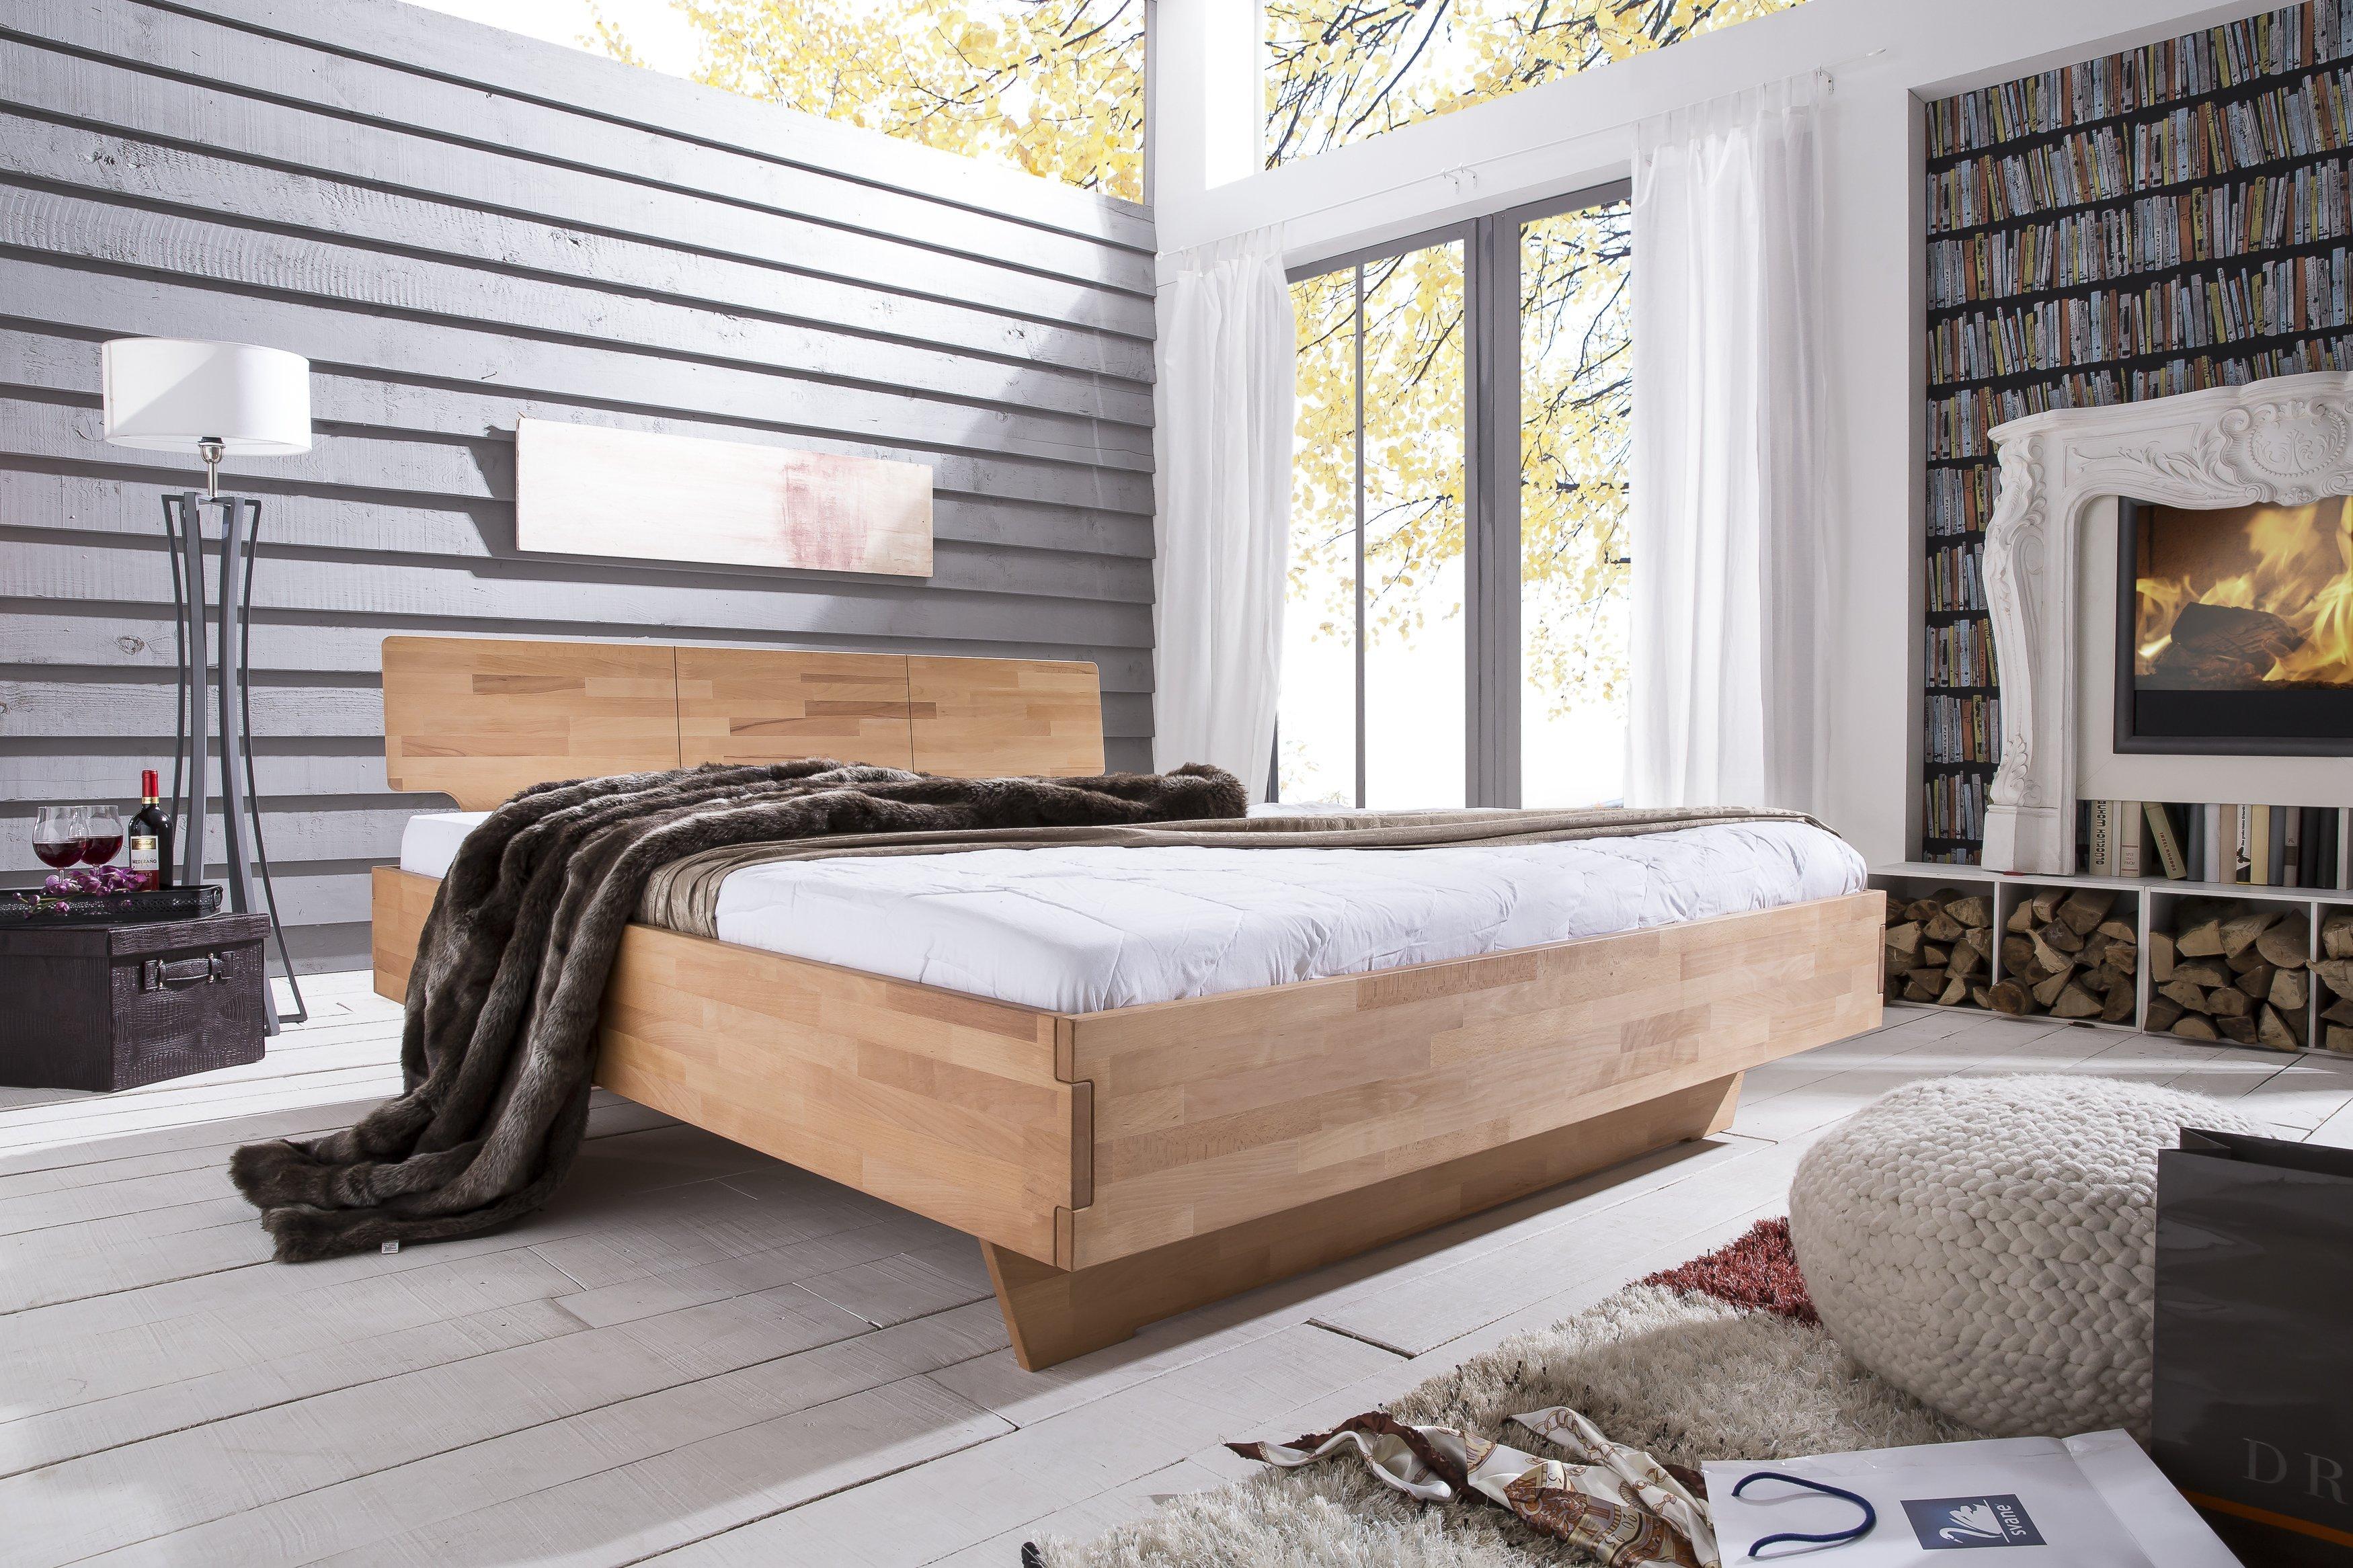 Massiv Holz Bett Cielo von Woodlive